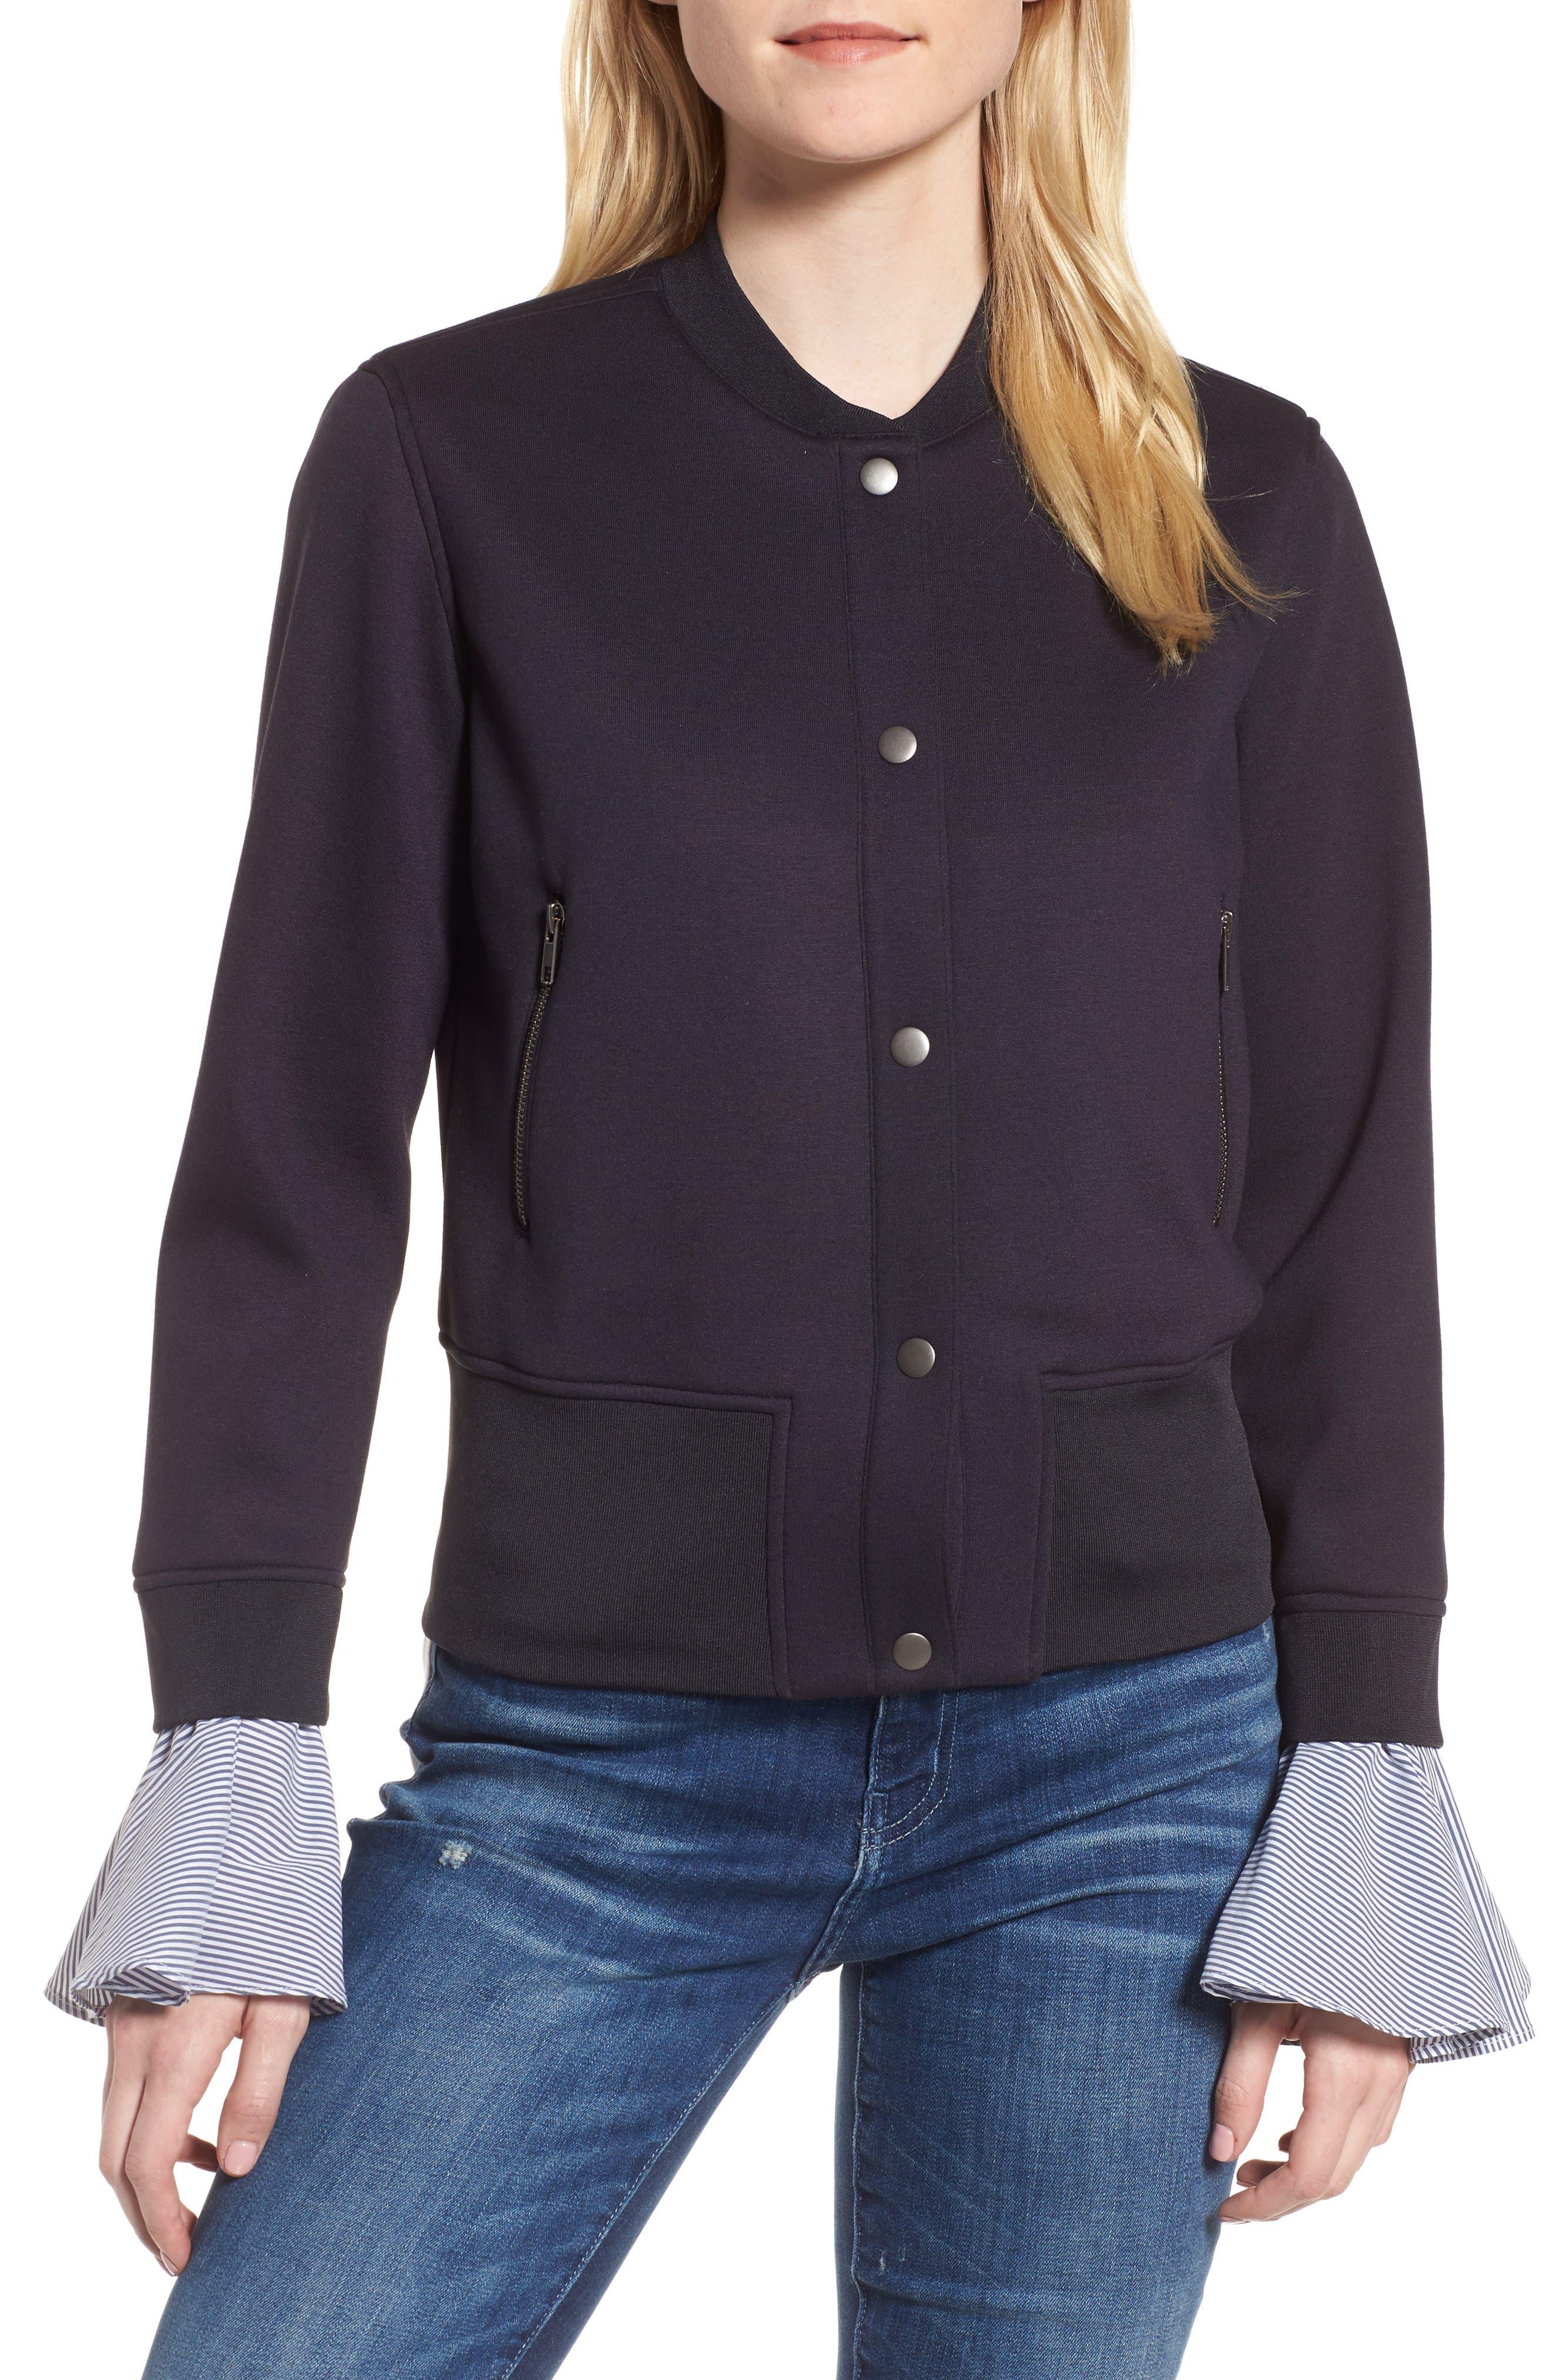 Main Image - Chelsea28 Ruffle Sleeve Jacket